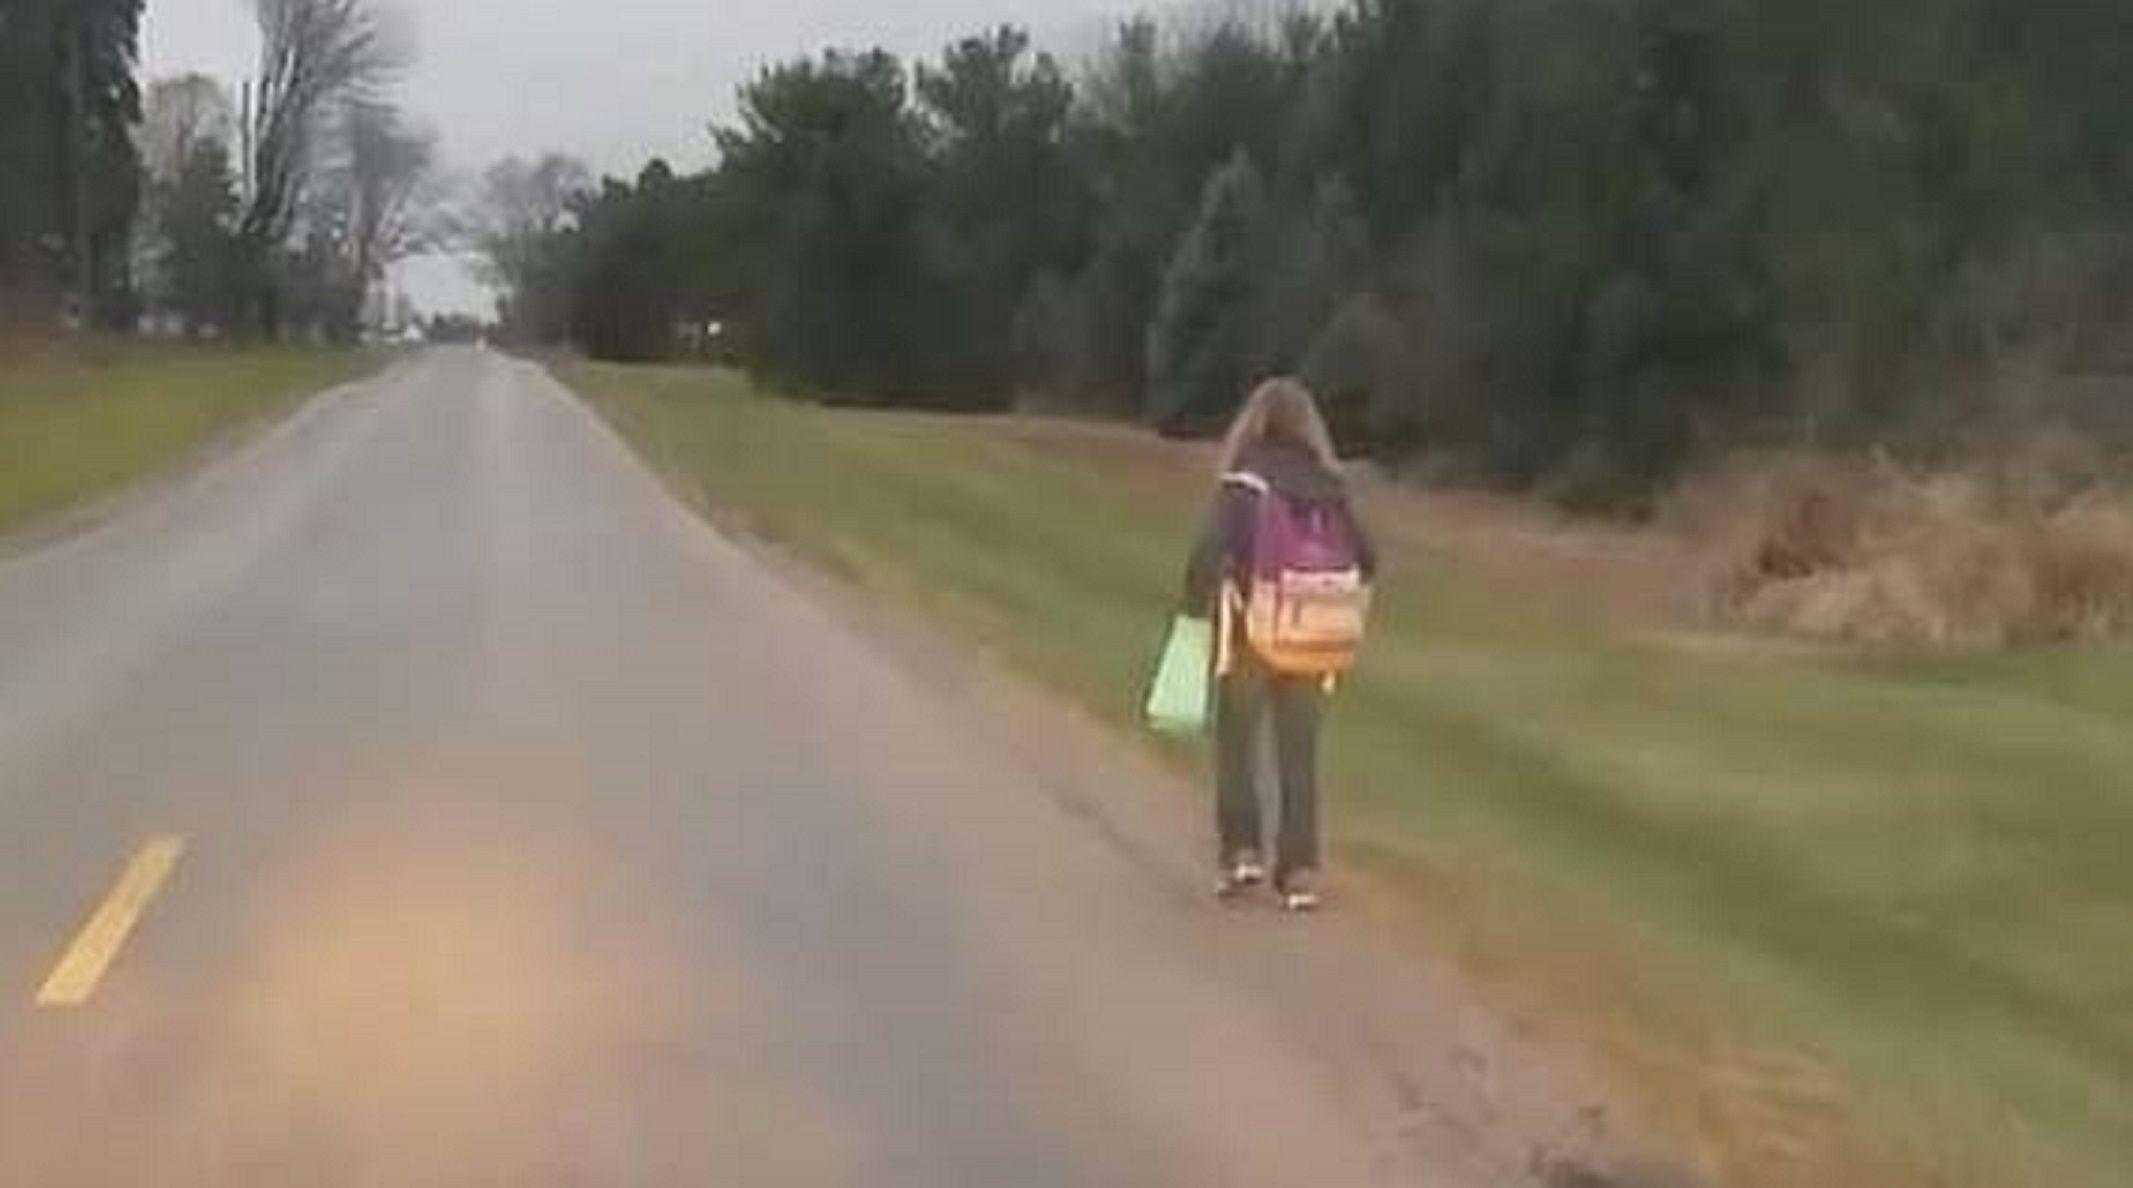 Un castigo que no olvidará: obligó a su hija a caminar 8 kilómetros por hacer bullying